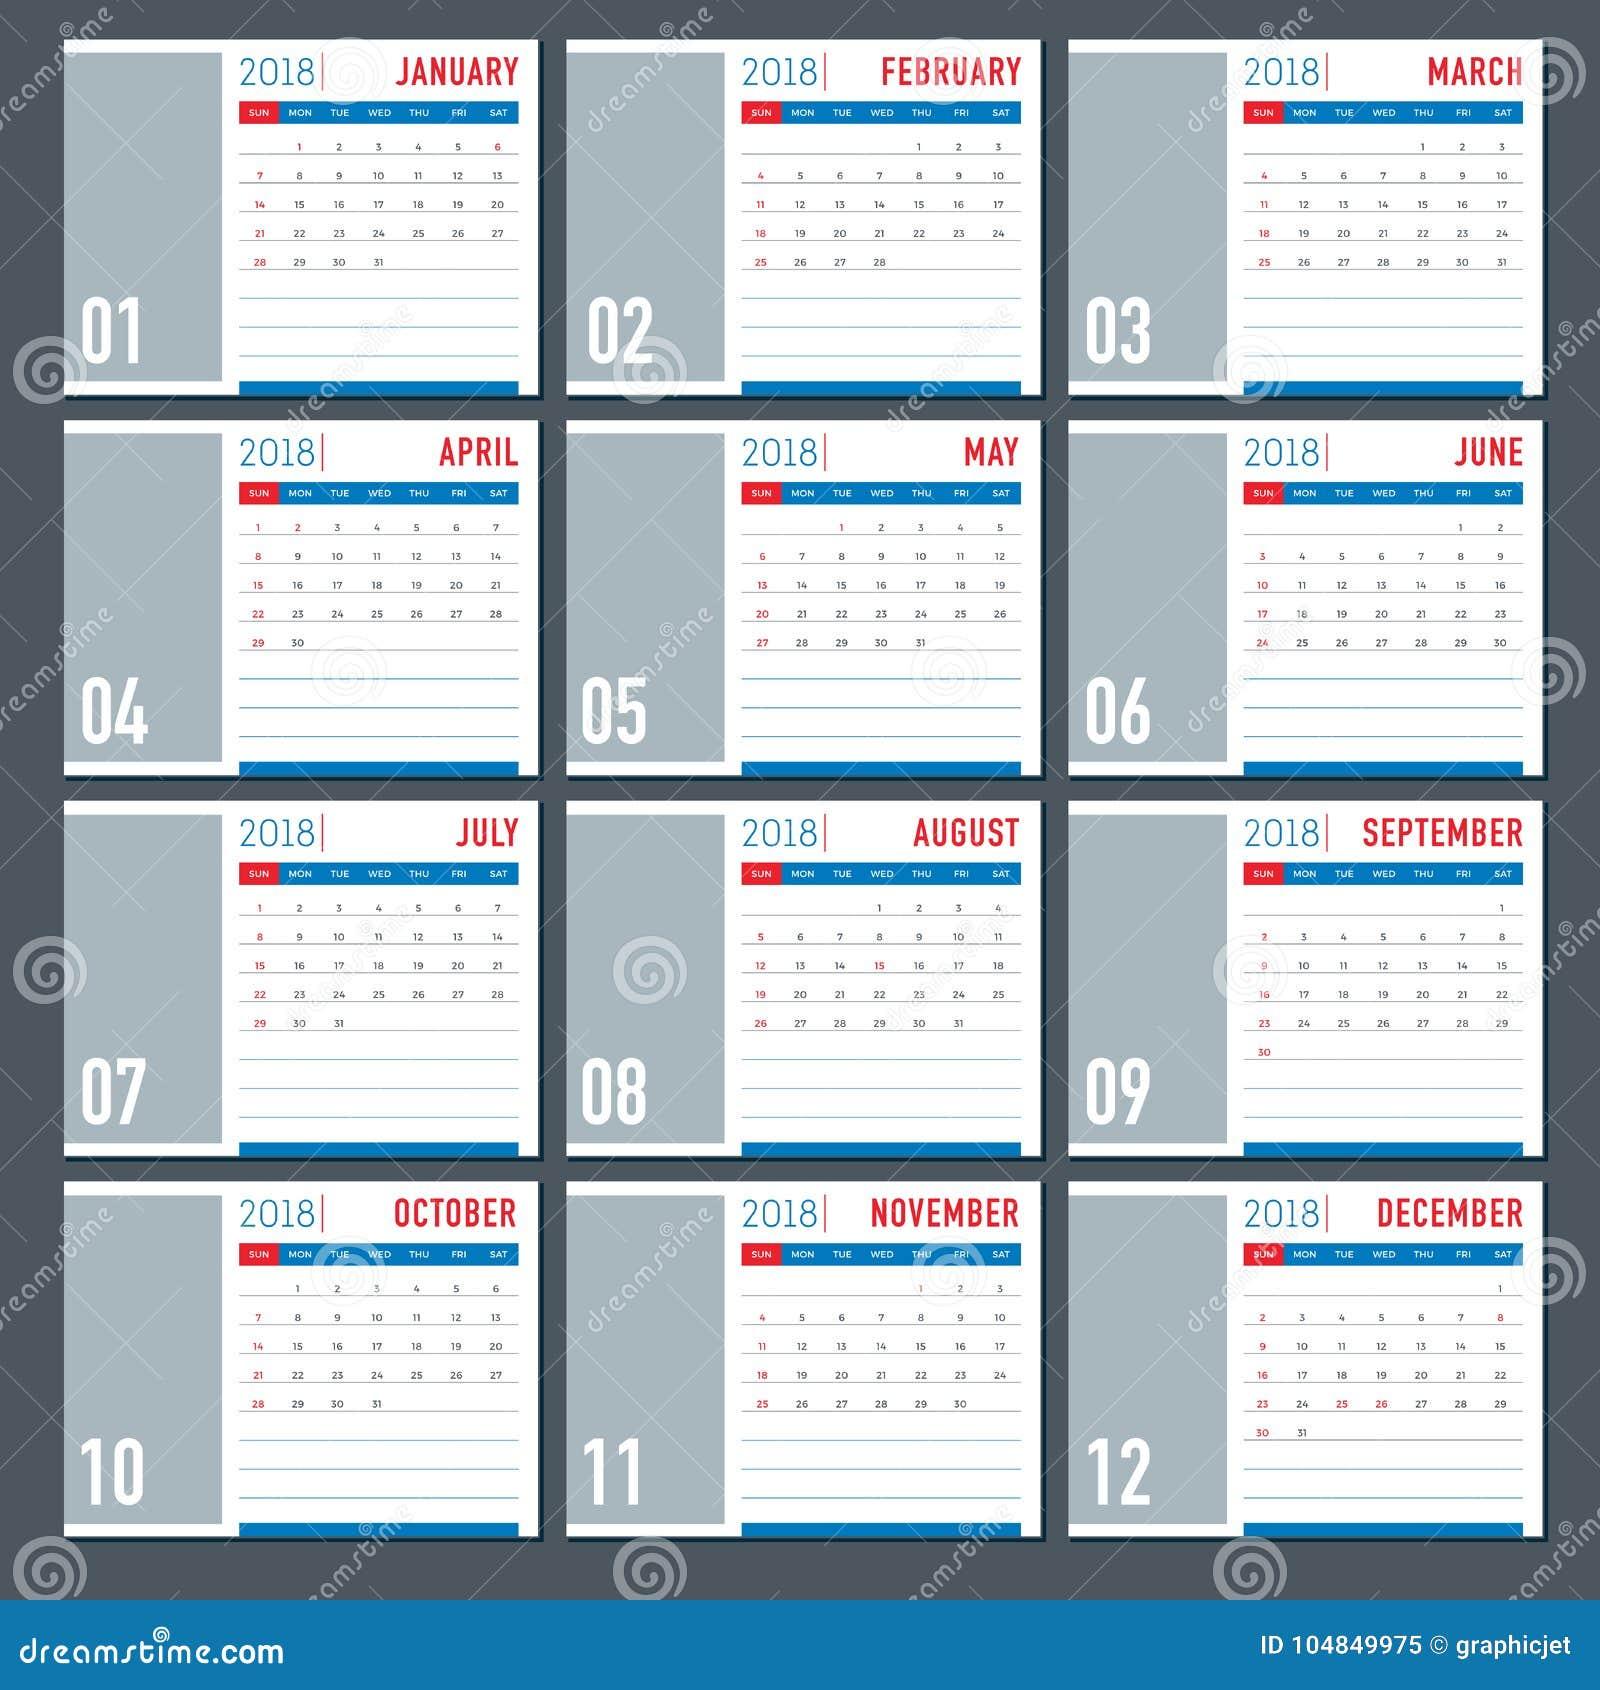 Table 2018 calendar template layout stock vector illustration of table 2018 calendar template layout saigontimesfo